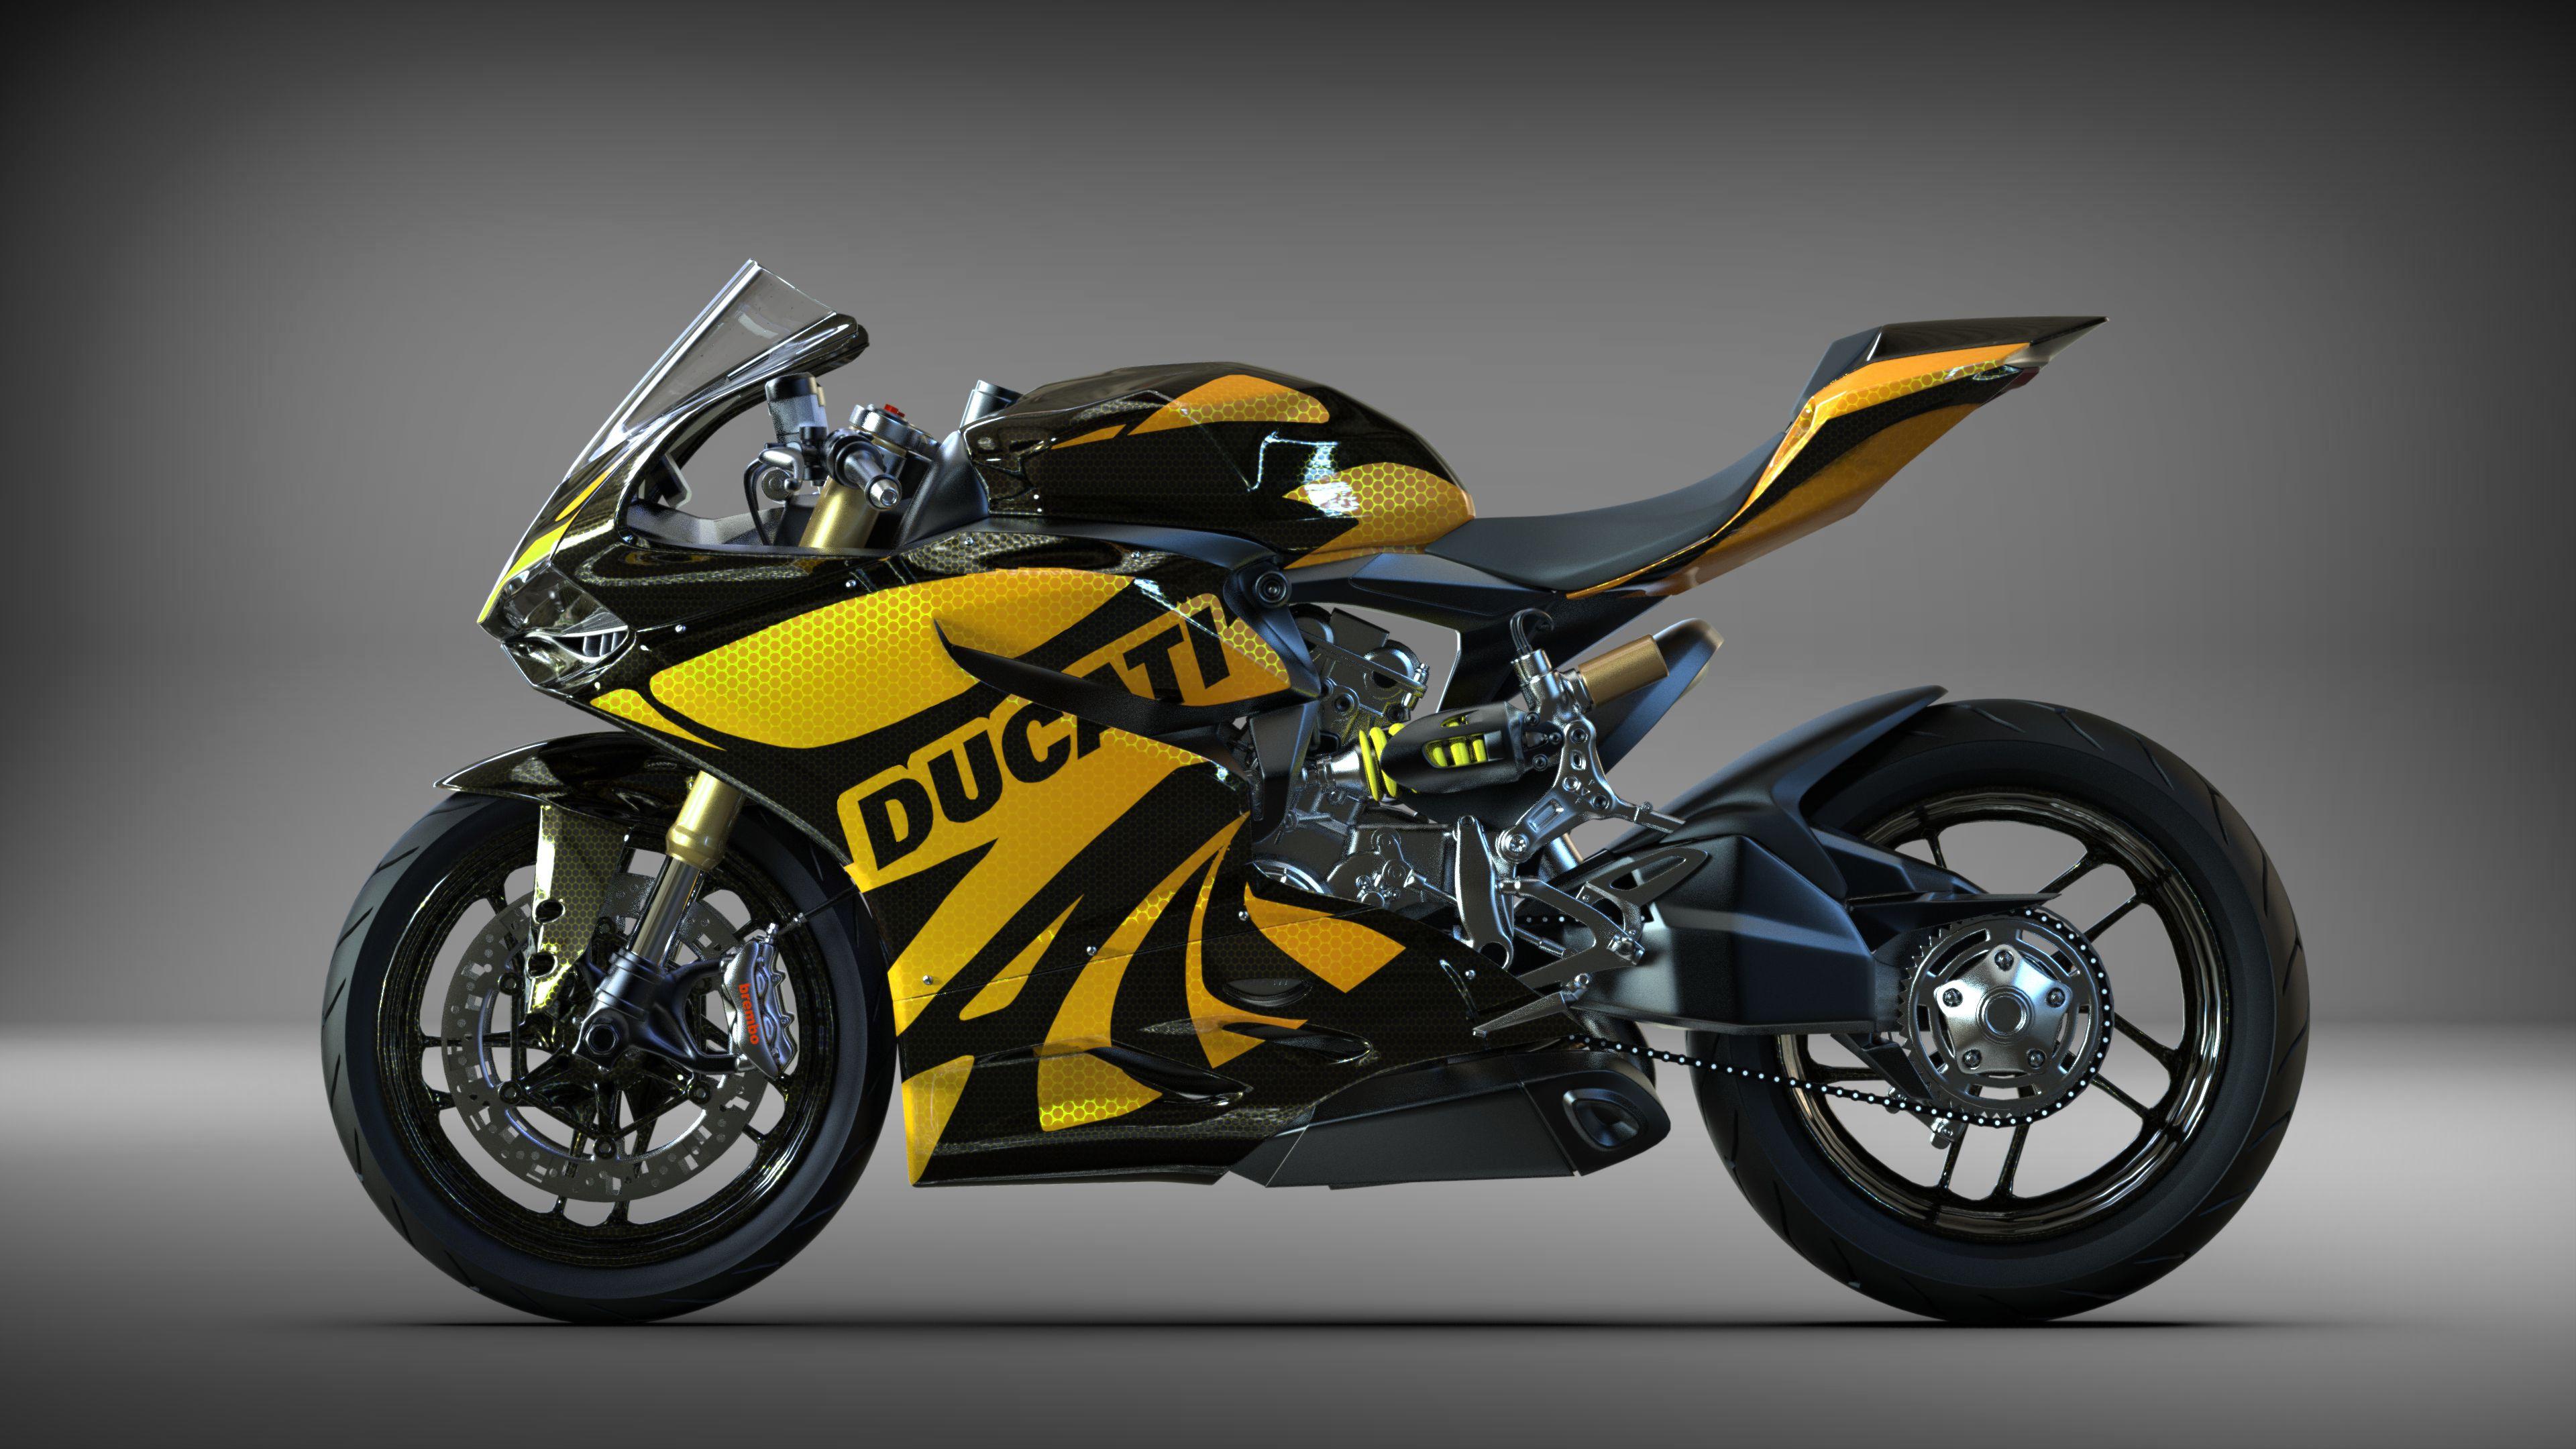 Ducati_Panigale_1199_2012_typeA_002